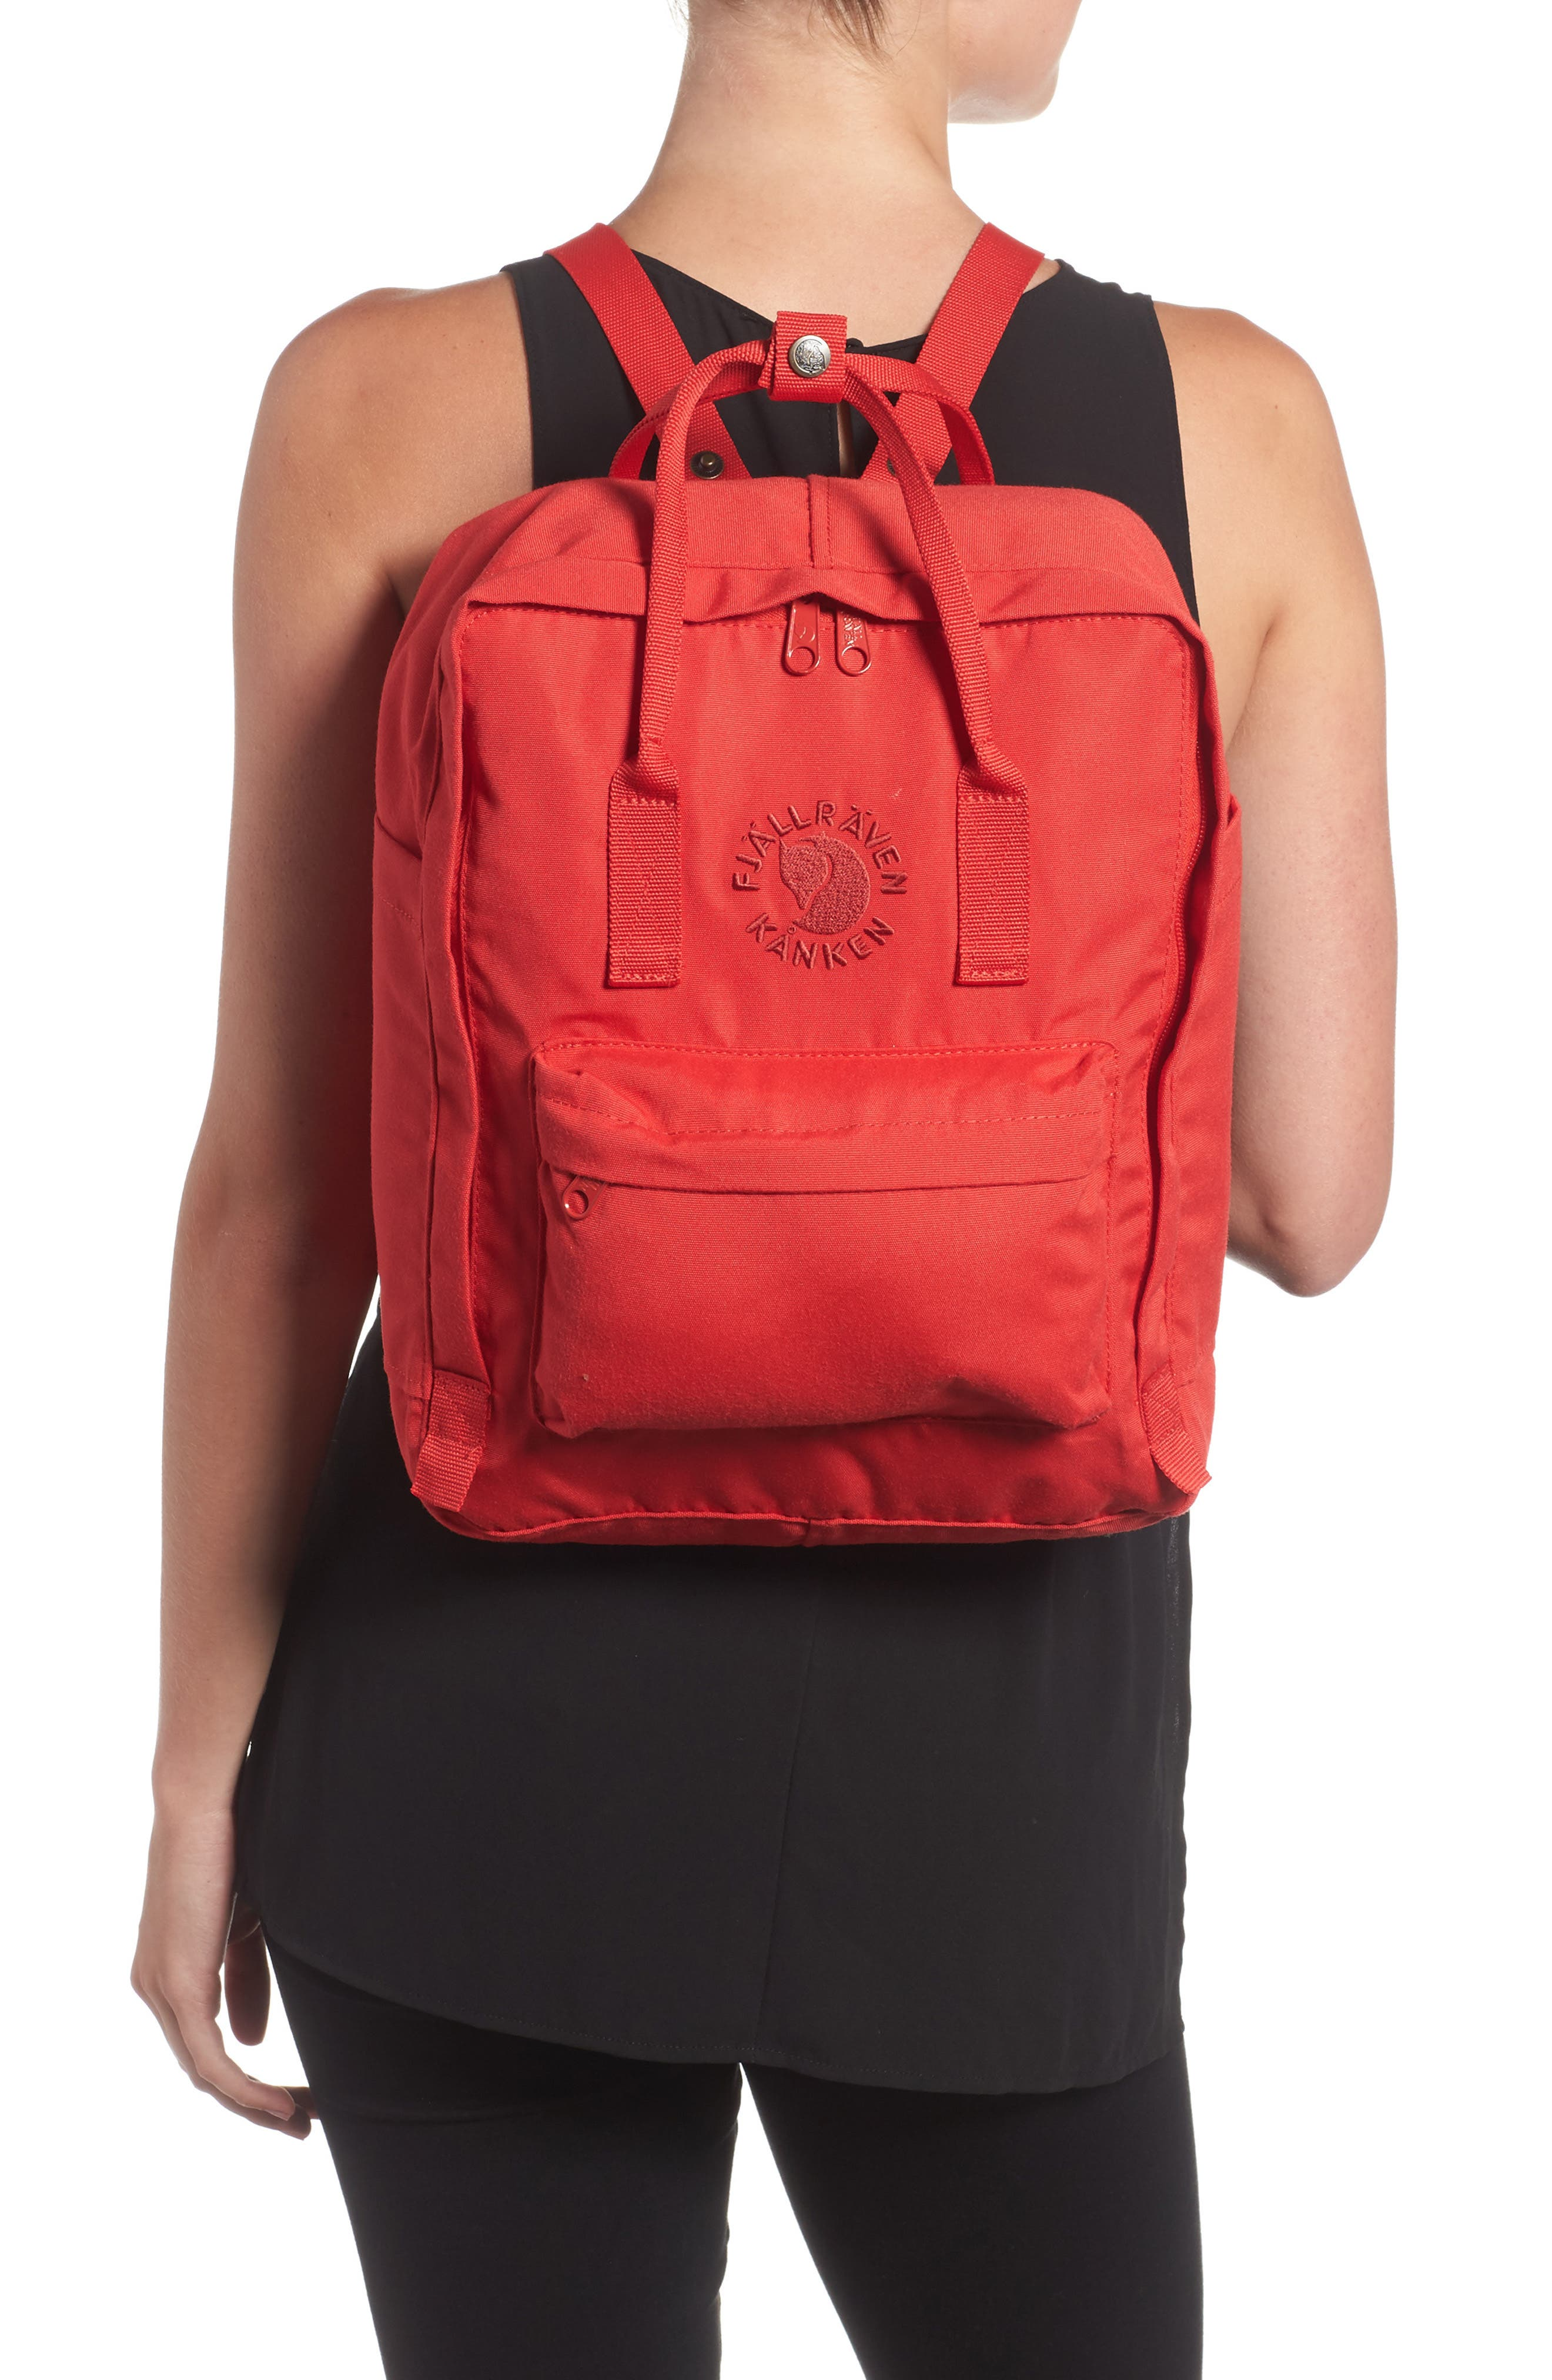 Re-Kånken Water Resistant Backpack,                             Alternate thumbnail 2, color,                             Red